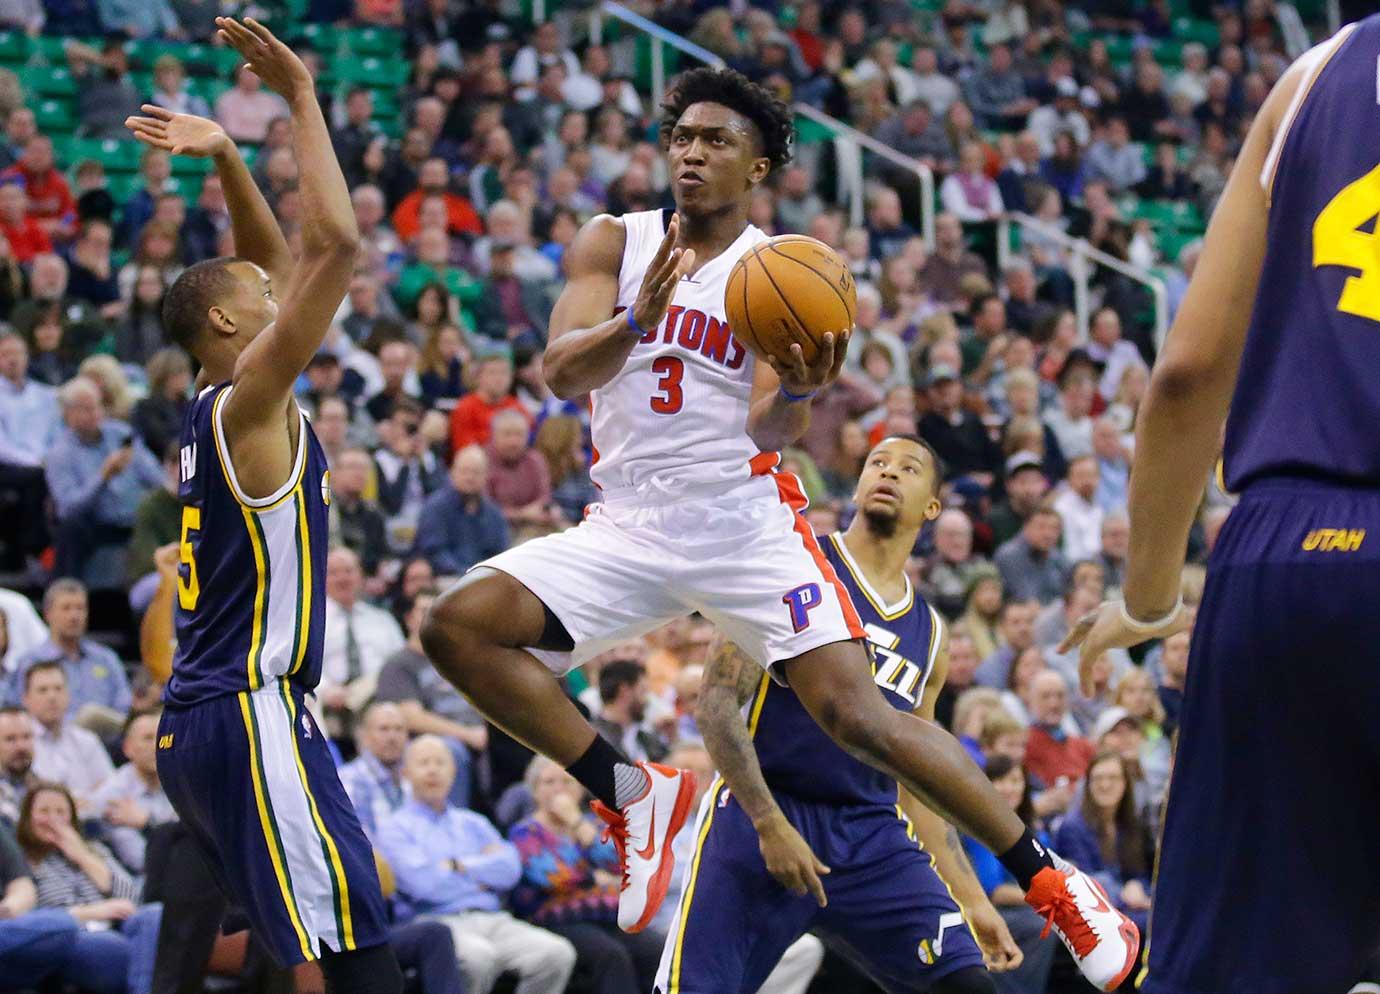 Detroit Pistons forward Stanley Johnson goes to the basket as Utah Jazz's Rodney Hood defends in Salt Lake City.